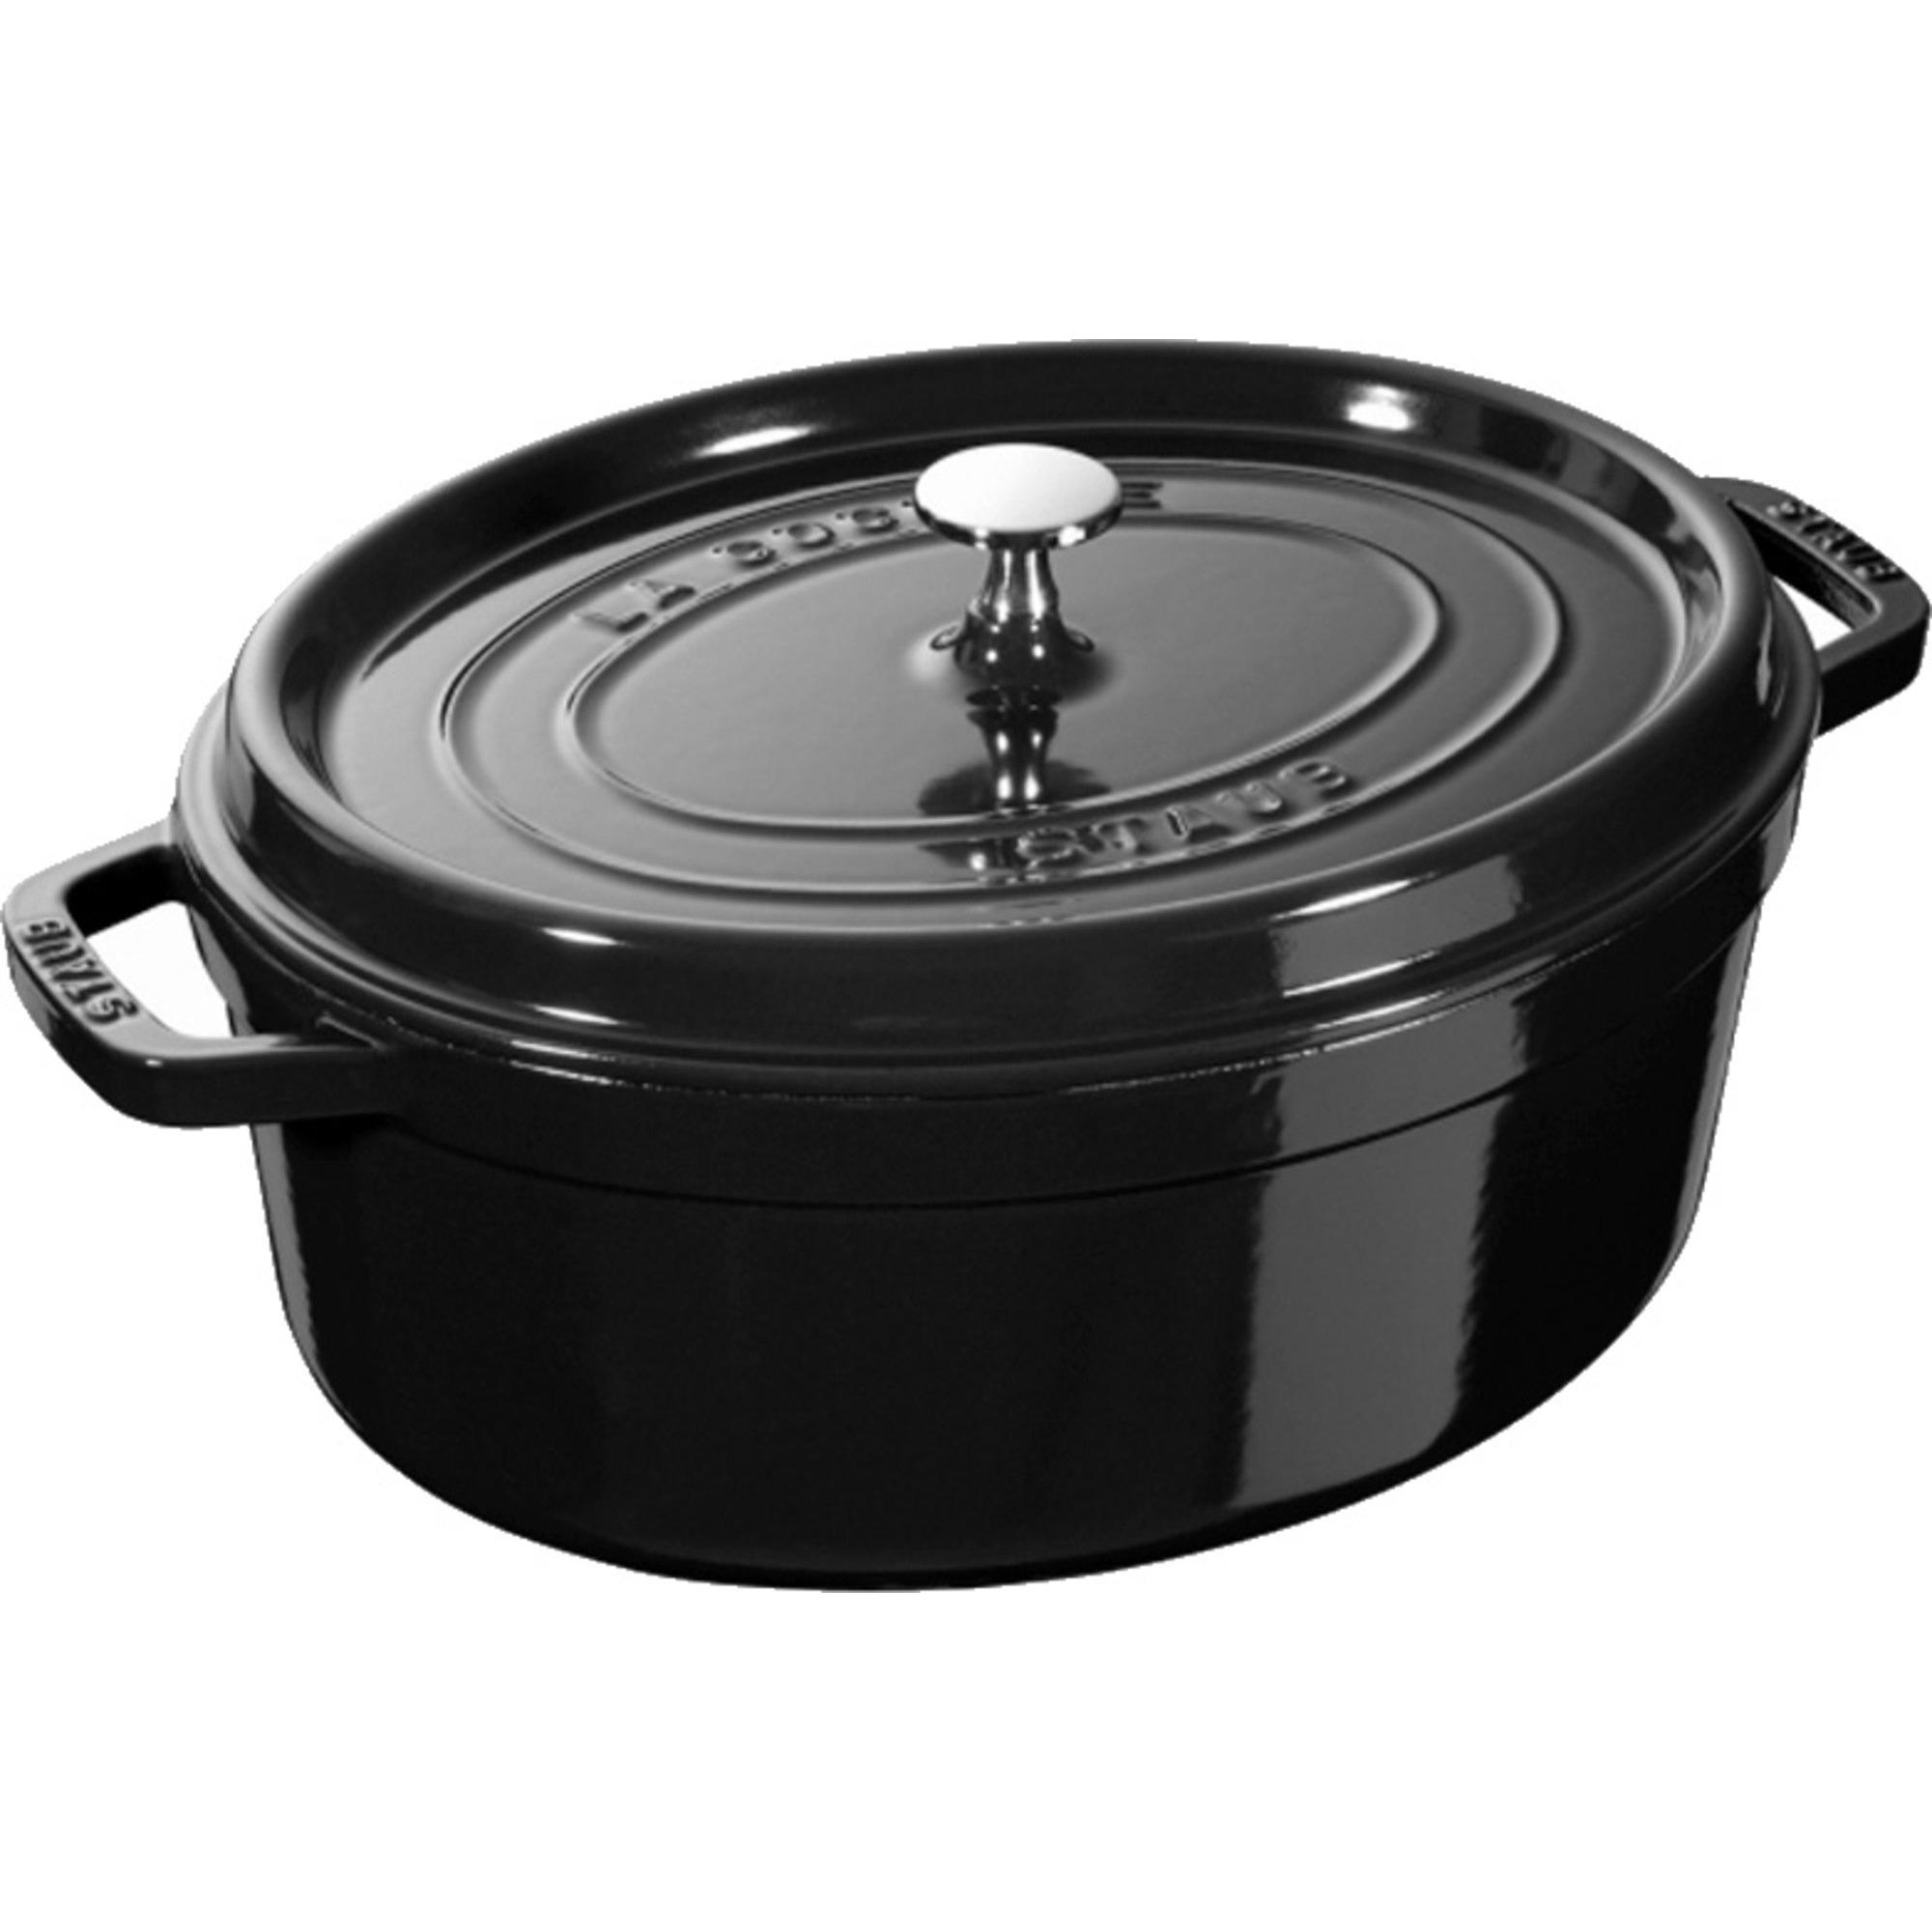 Staub Limited Edition Oval gryta 31 cm 54 liter Blank svart